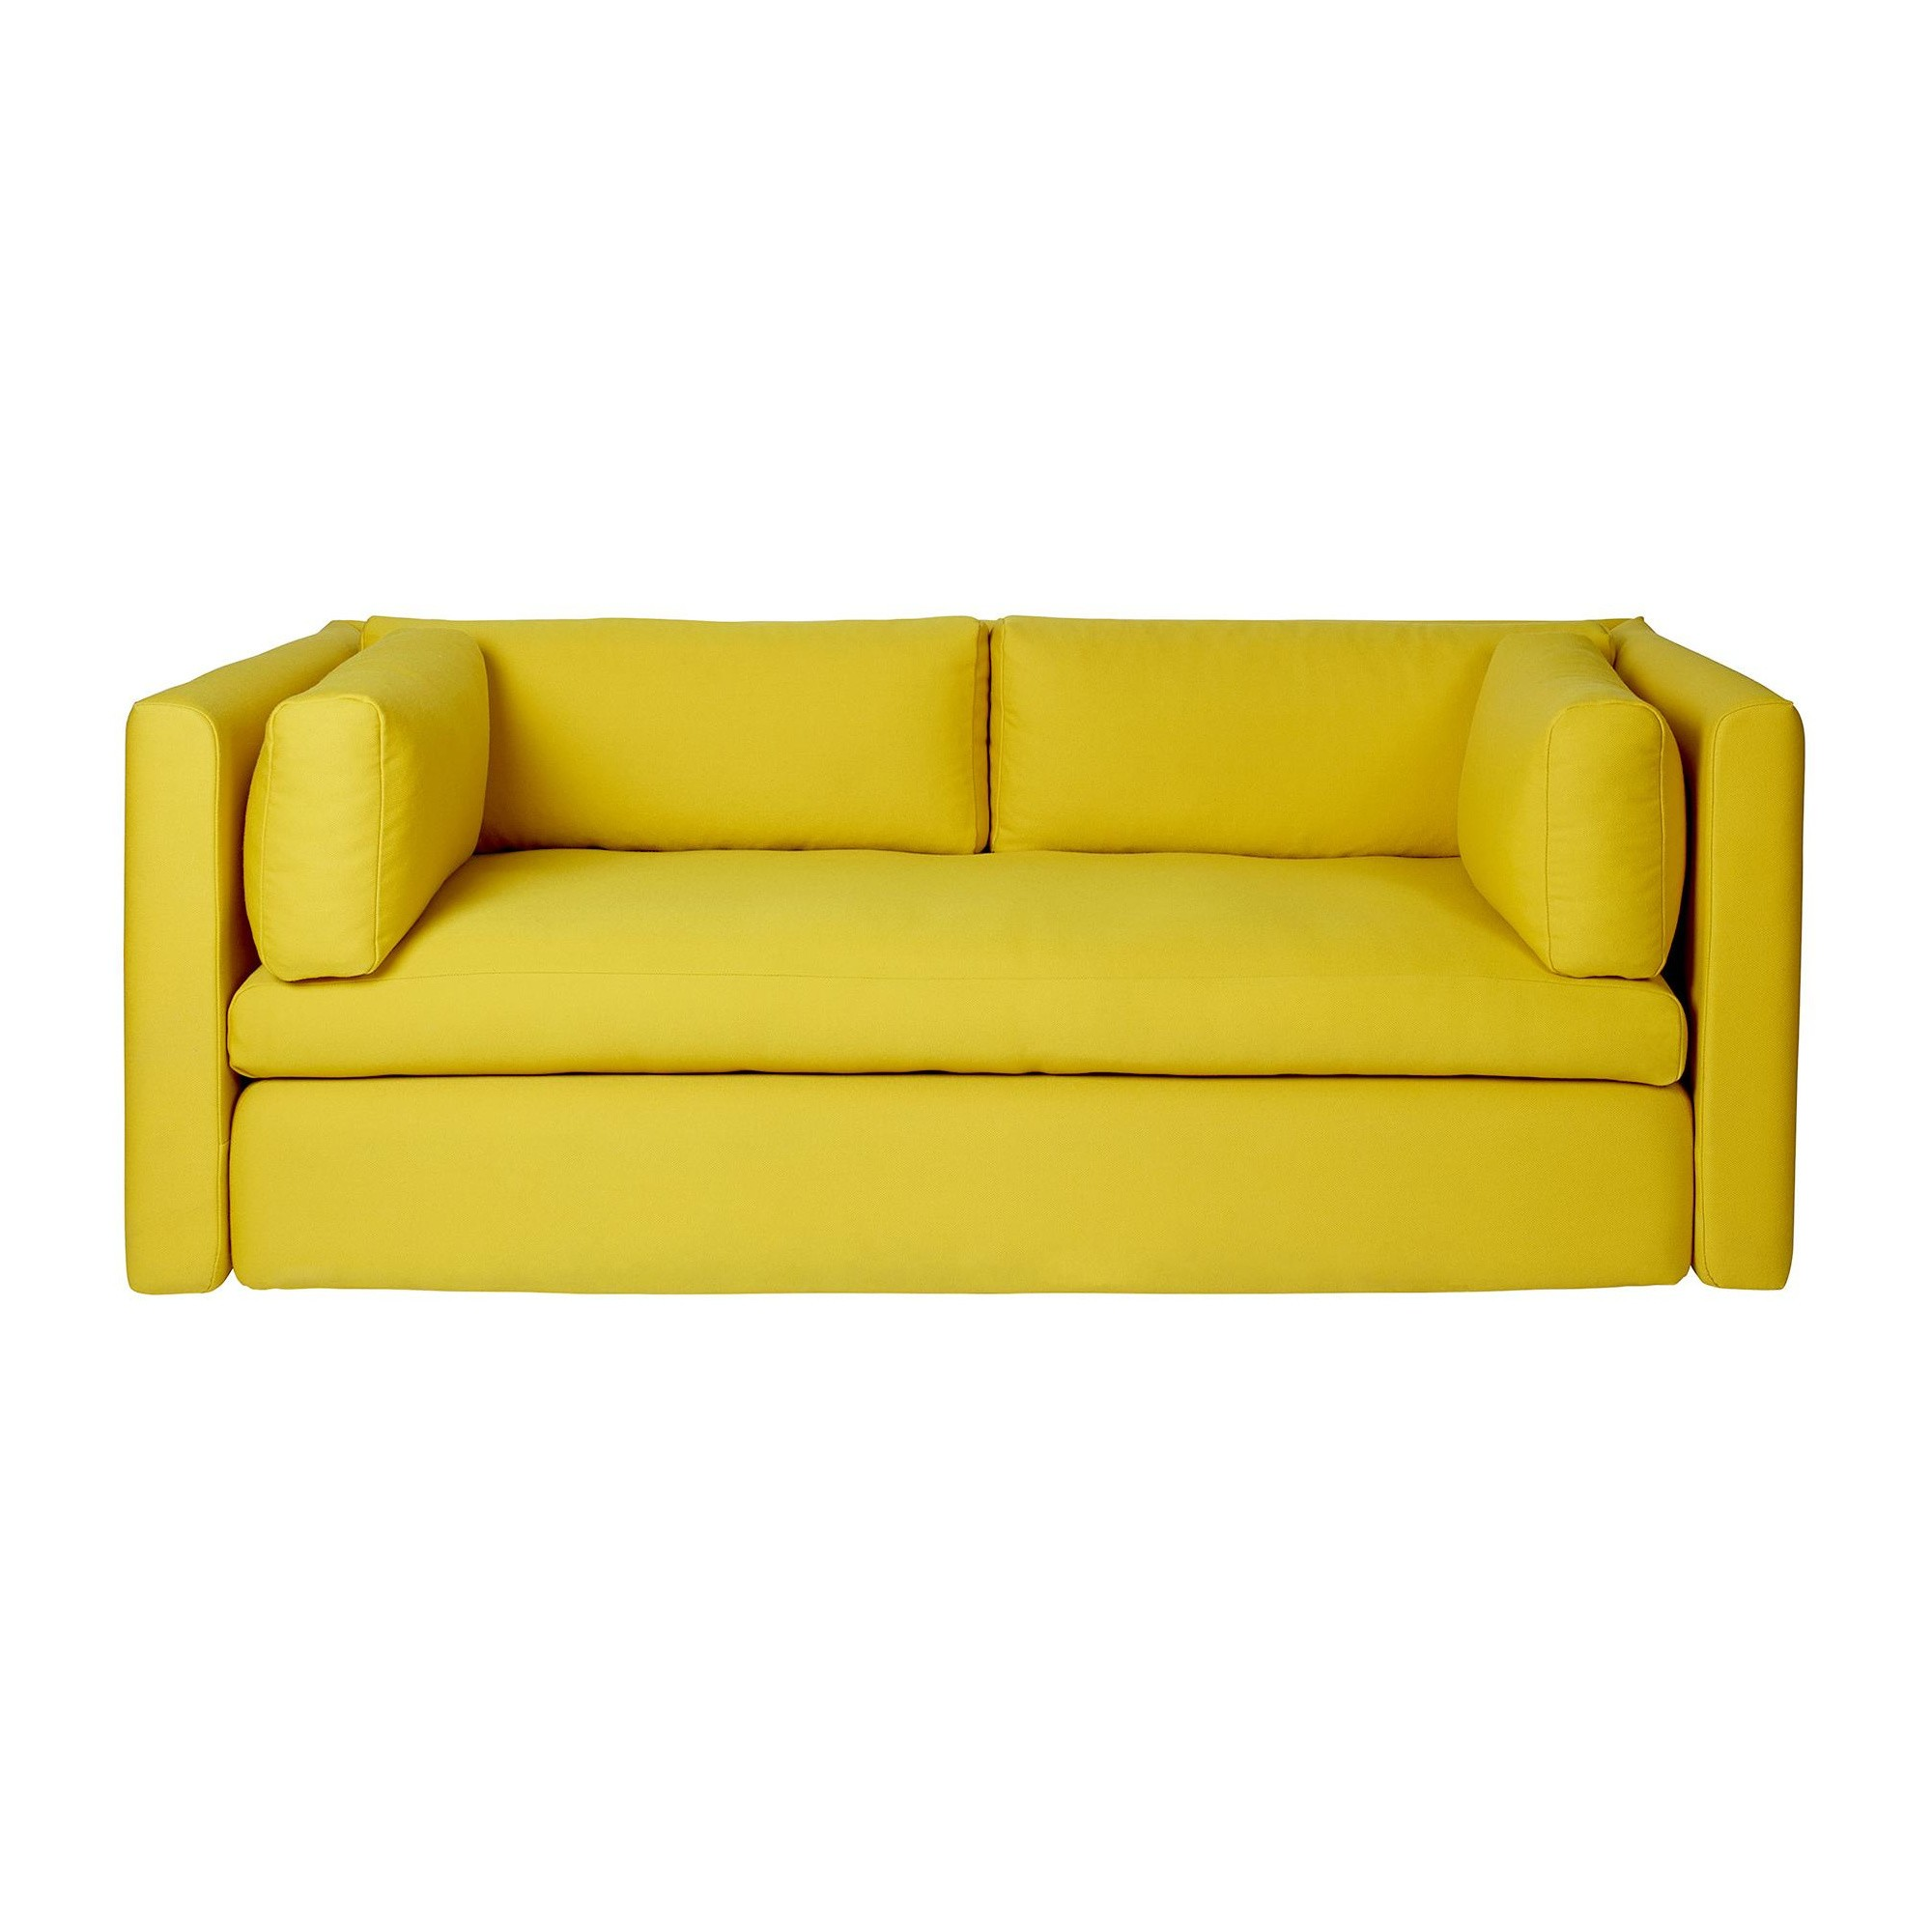 Fine Hackney 2 Seater Sofa Machost Co Dining Chair Design Ideas Machostcouk